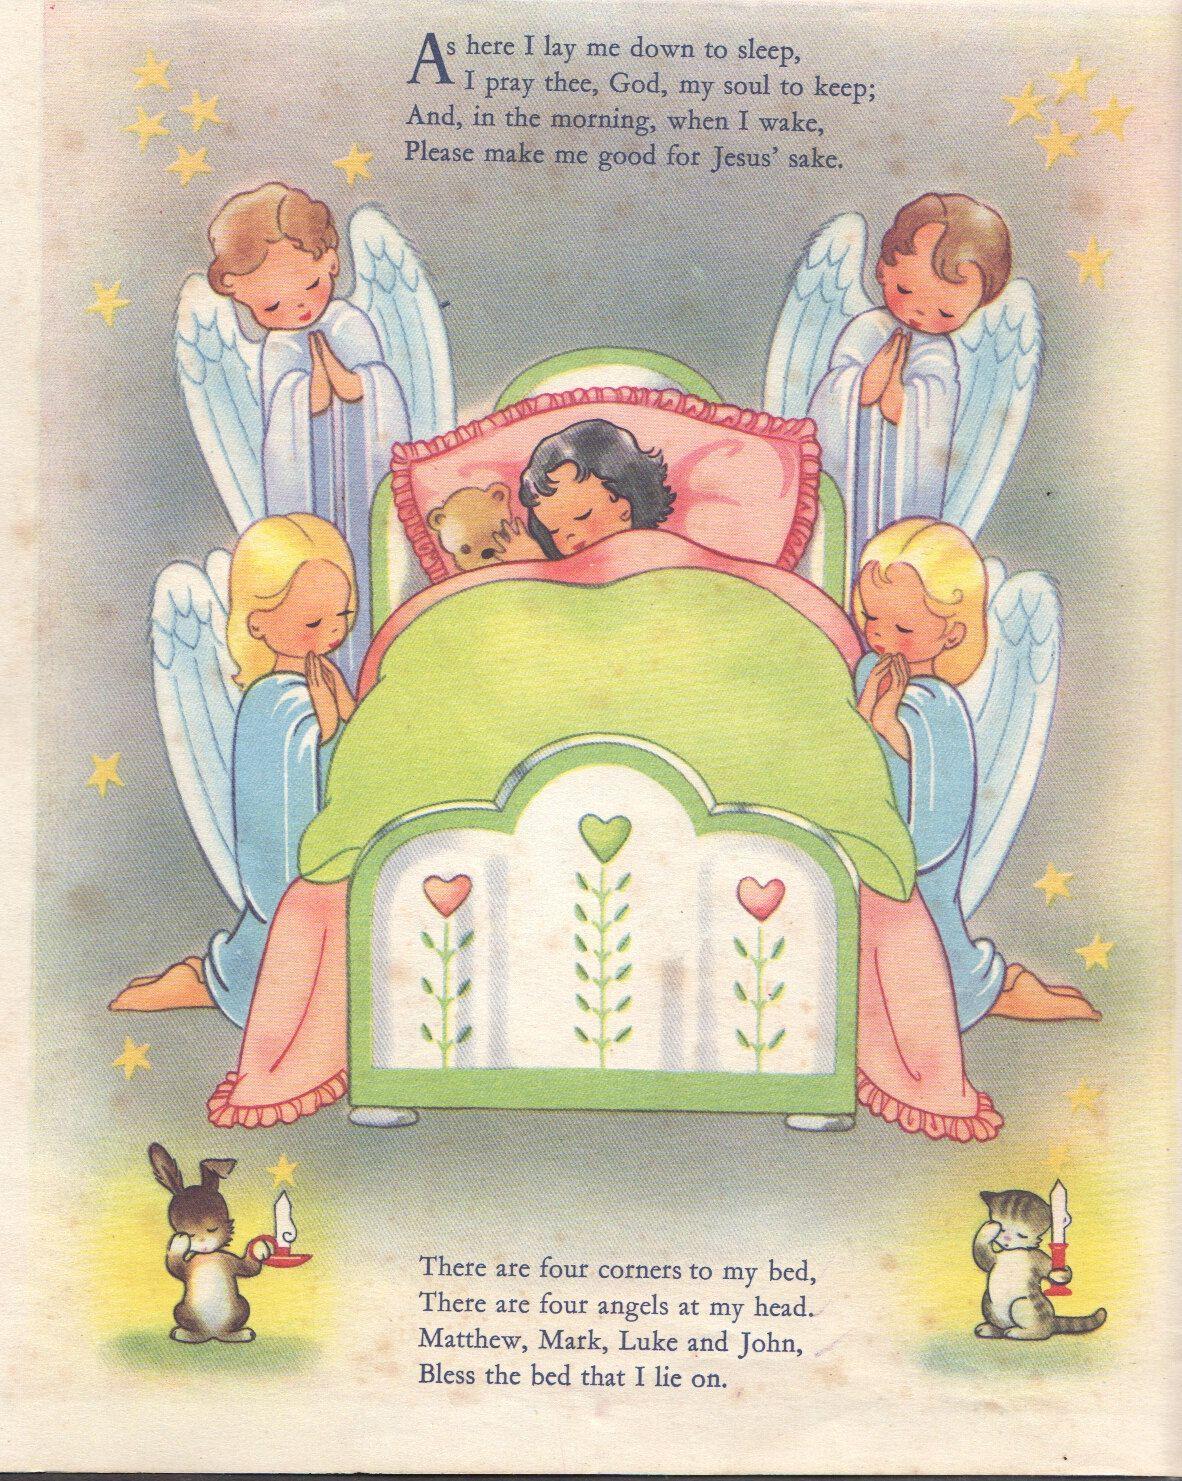 As here I lay me down to sleep, I pray thee, God, my soul to keep ...